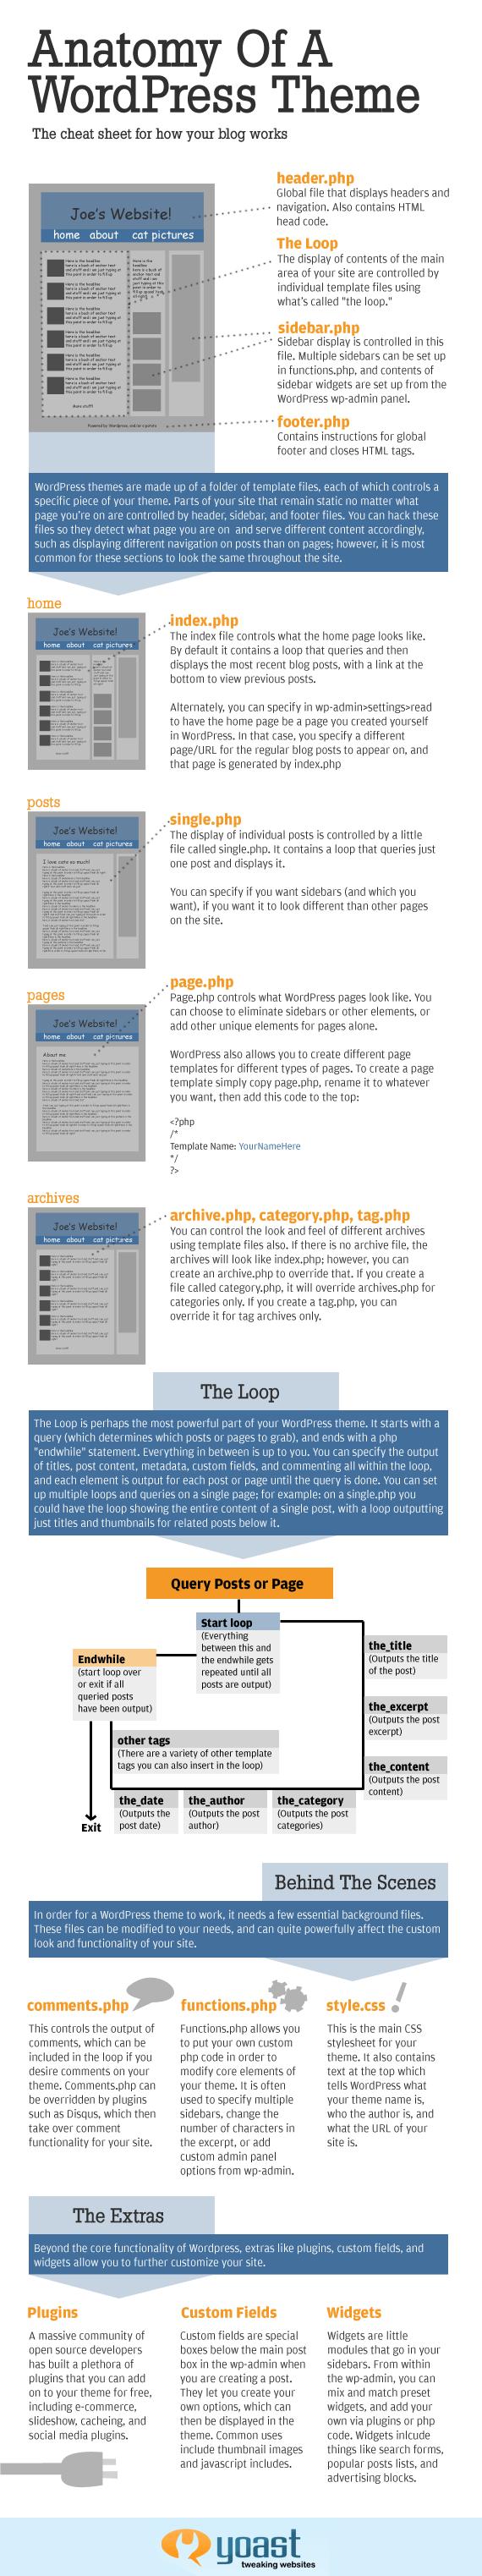 Anatomy of WordPress theme - Yoast